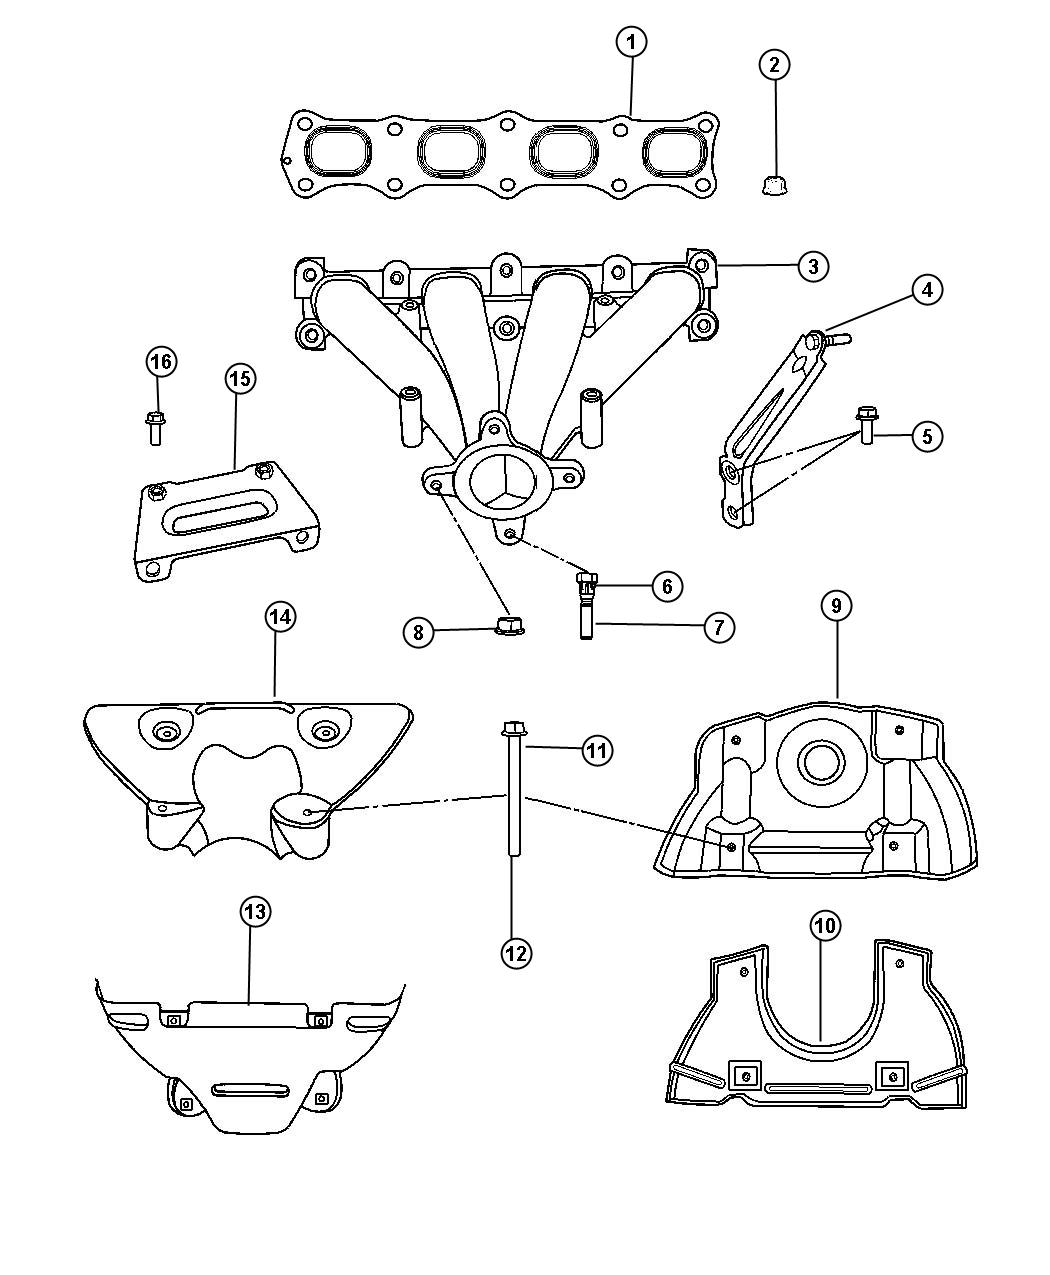 Jeep Patriot Shield. Exhaust manifold, heat. Lower. Fwd